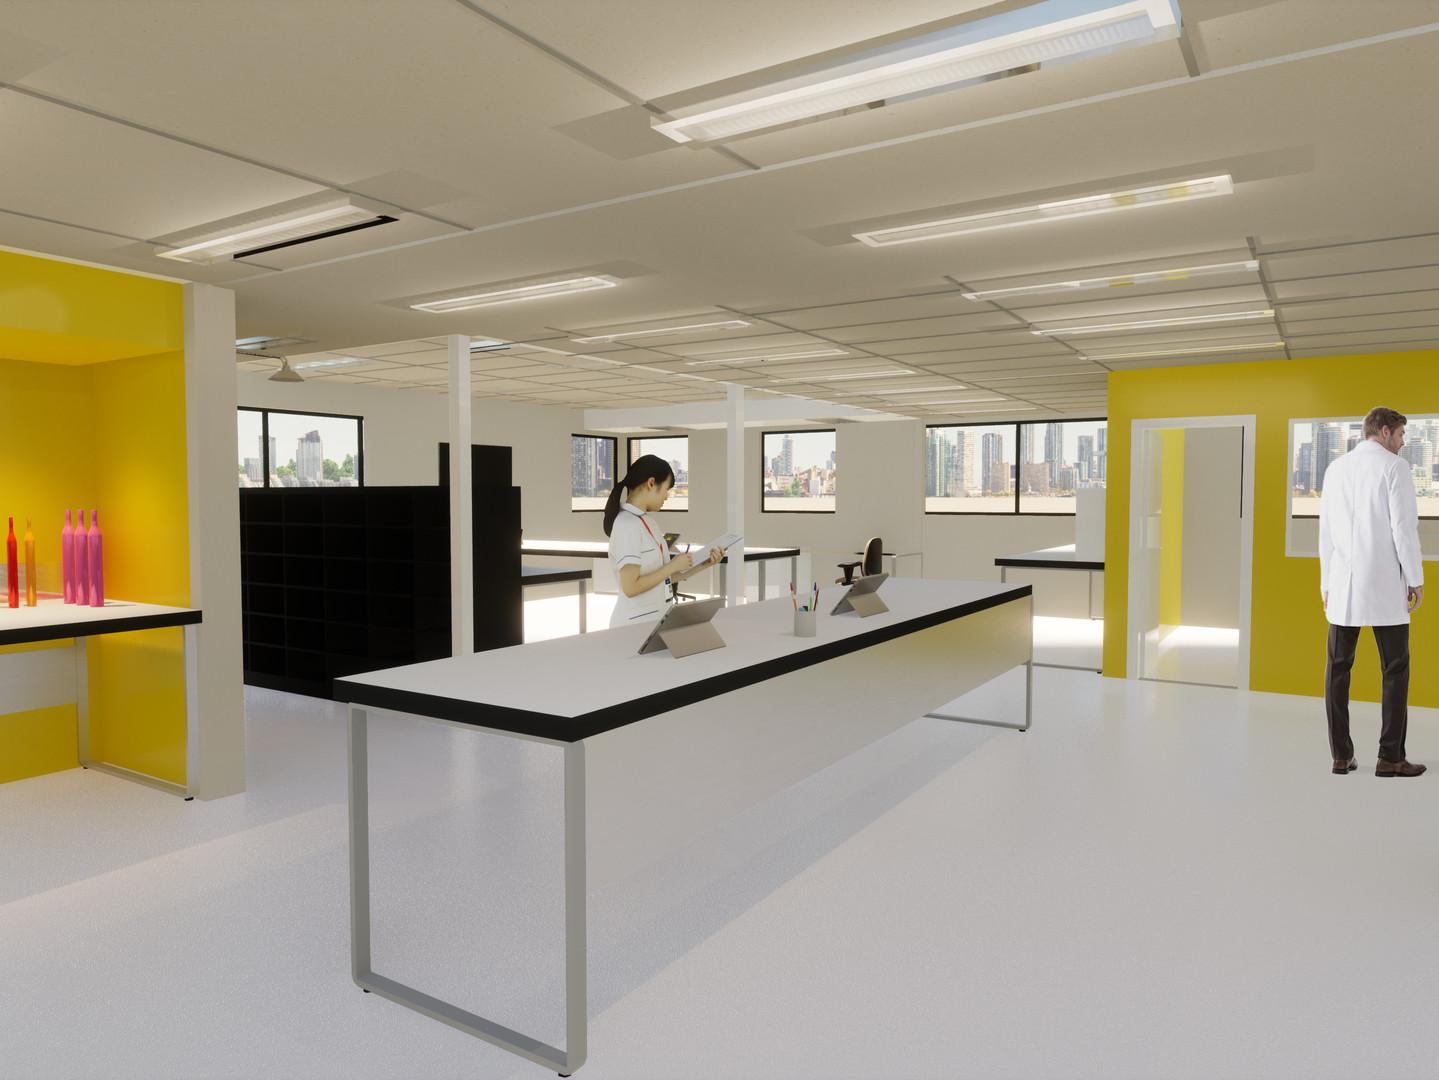 Interior Image.jpg